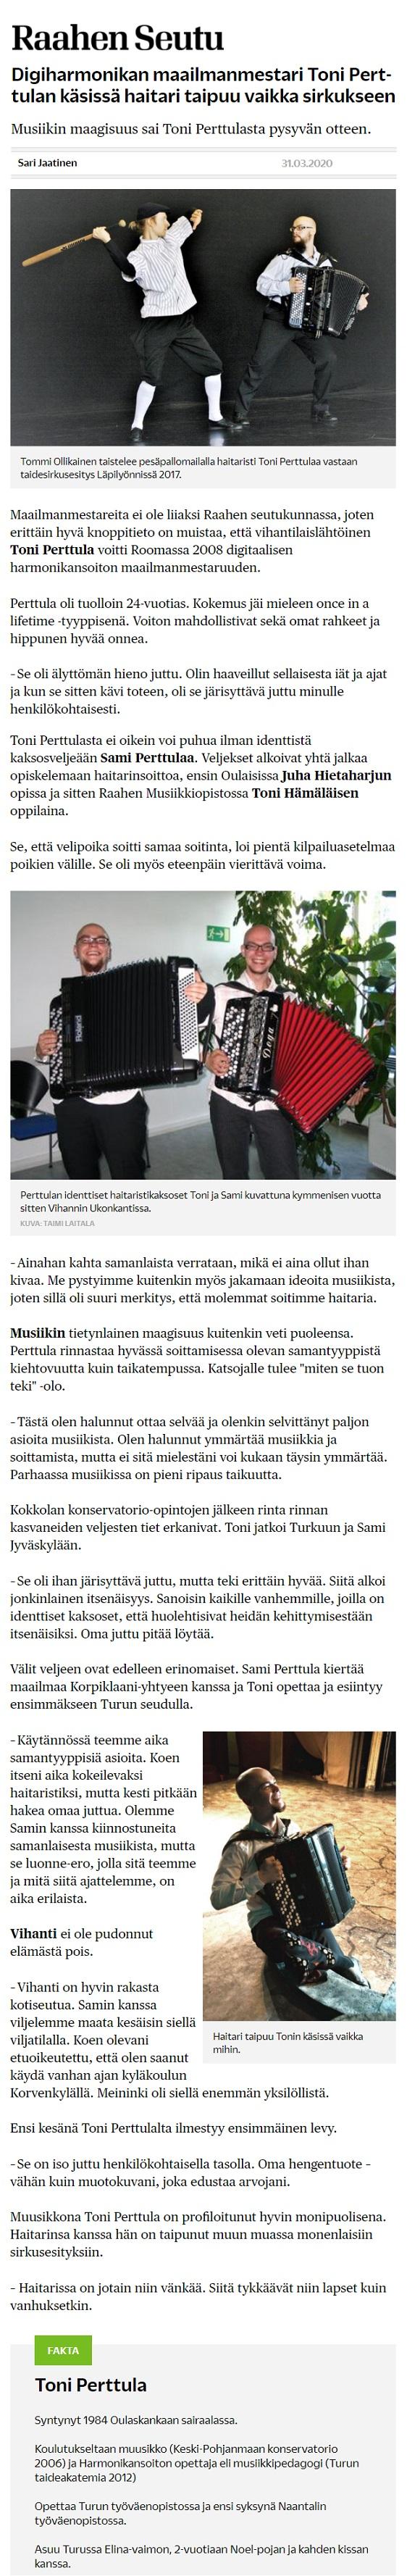 Raahen Seutu (Finland), 30.3.2020